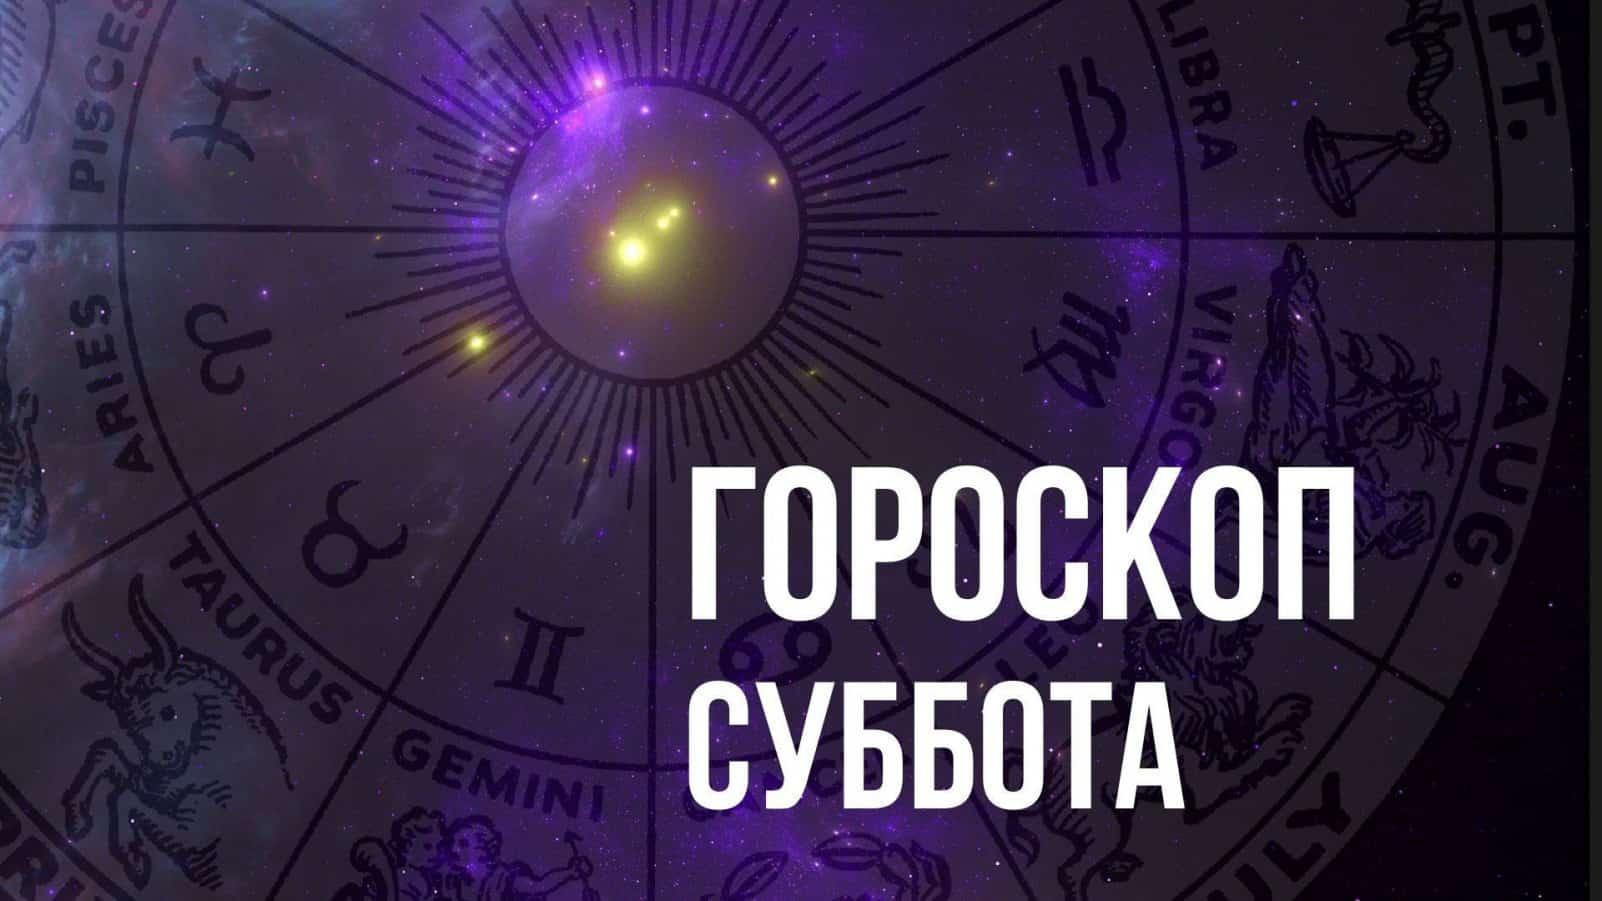 Гороскоп на субботу 26 июня для каждого знака Зодиака